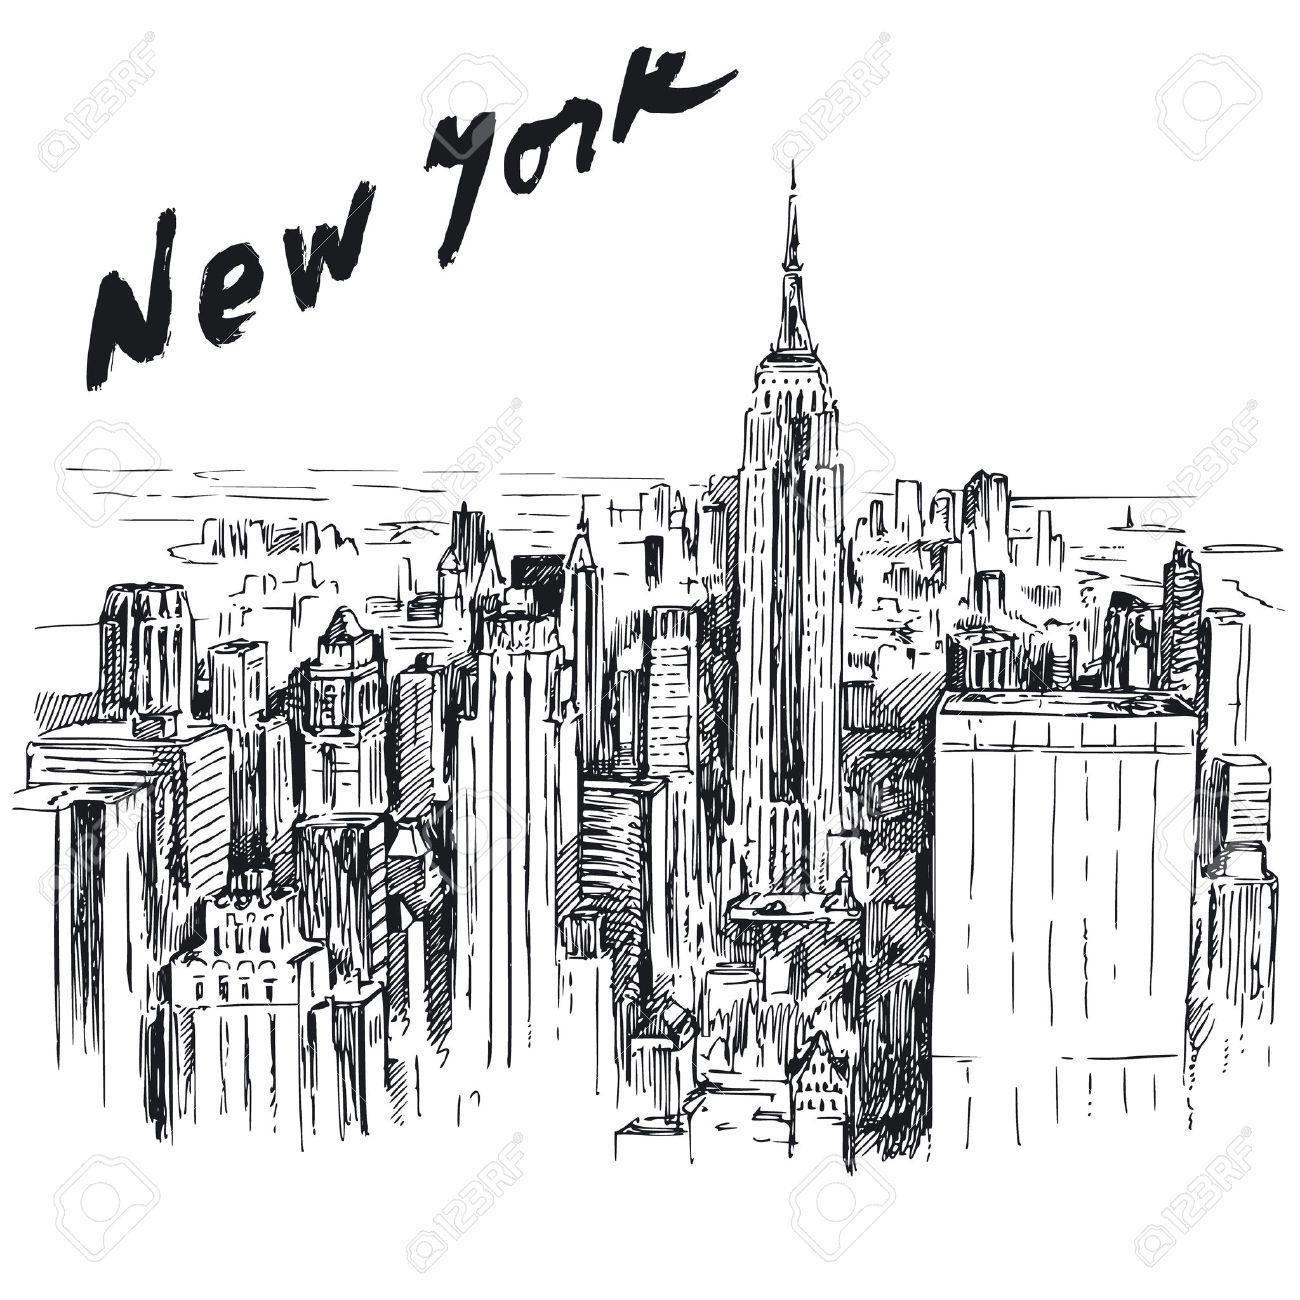 New York - hand drawn illustration Stock Vector - 18989583